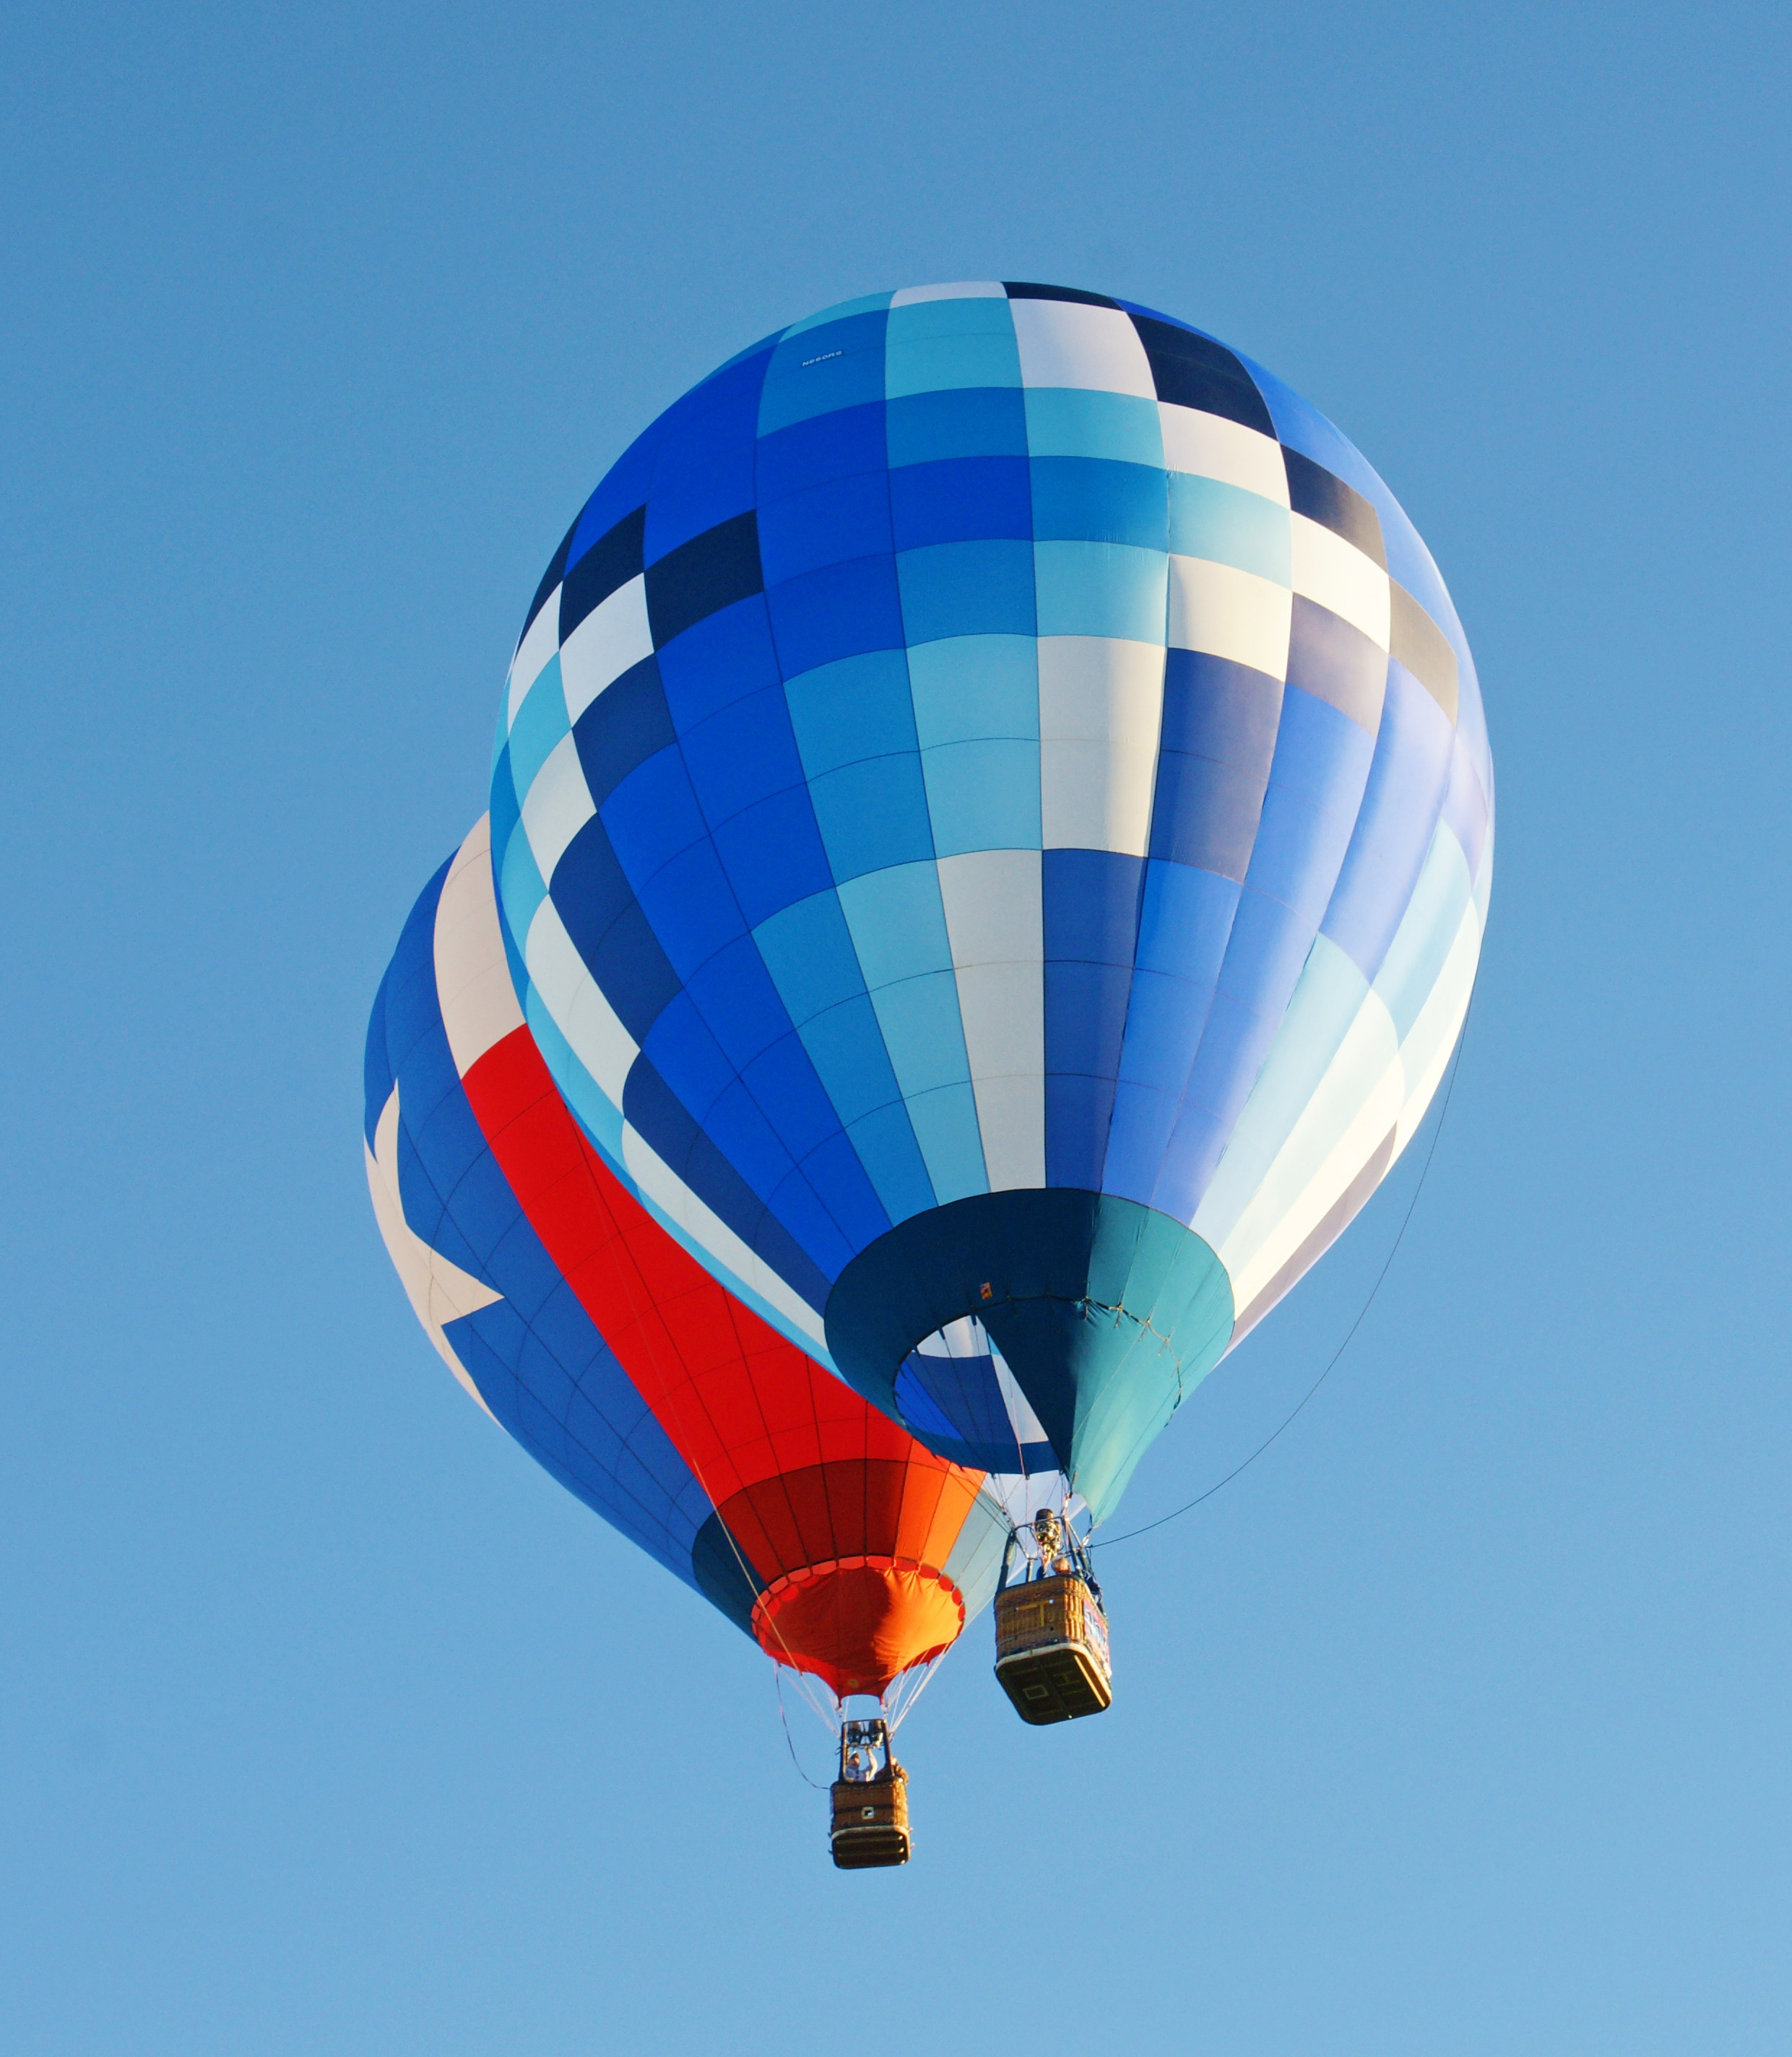 aibf-Single-Balloons-Gallery07